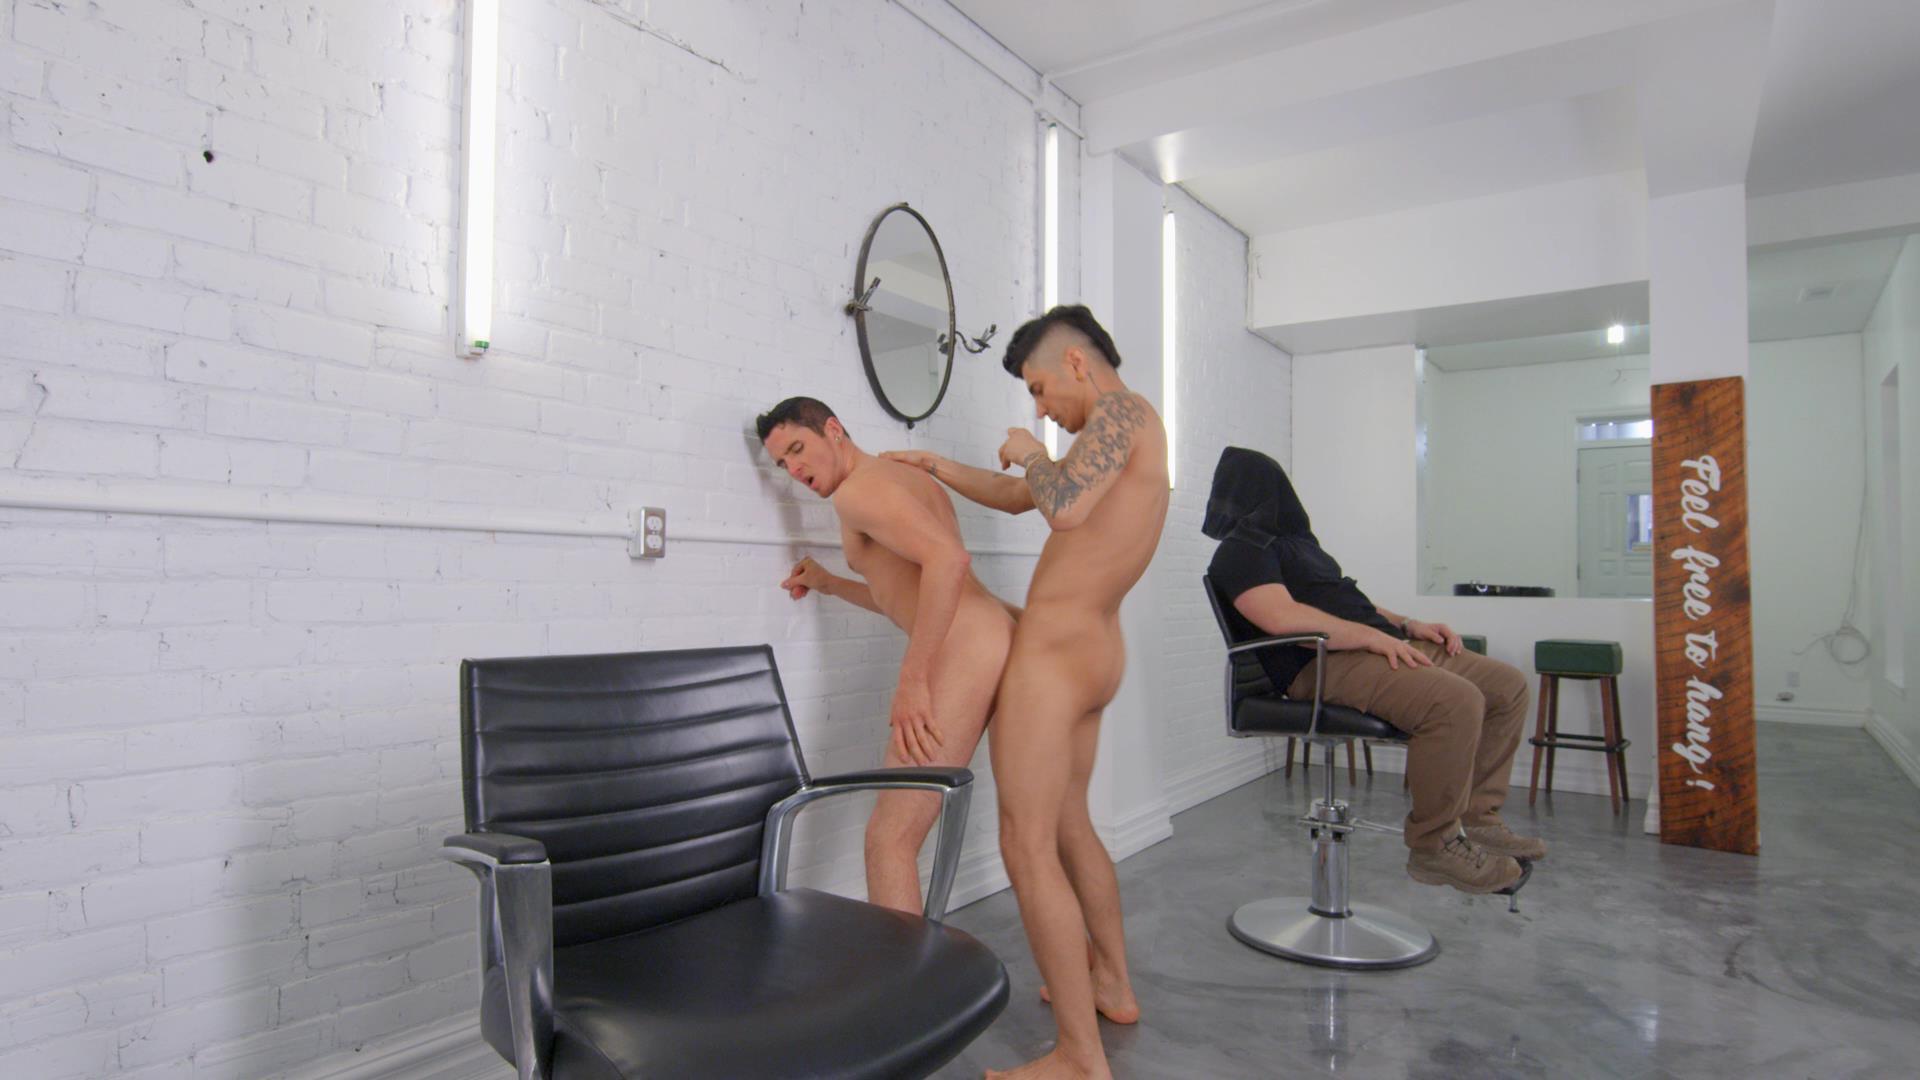 Dudes In Public 47 - Barbershop - San Bass / Killiam Wesker